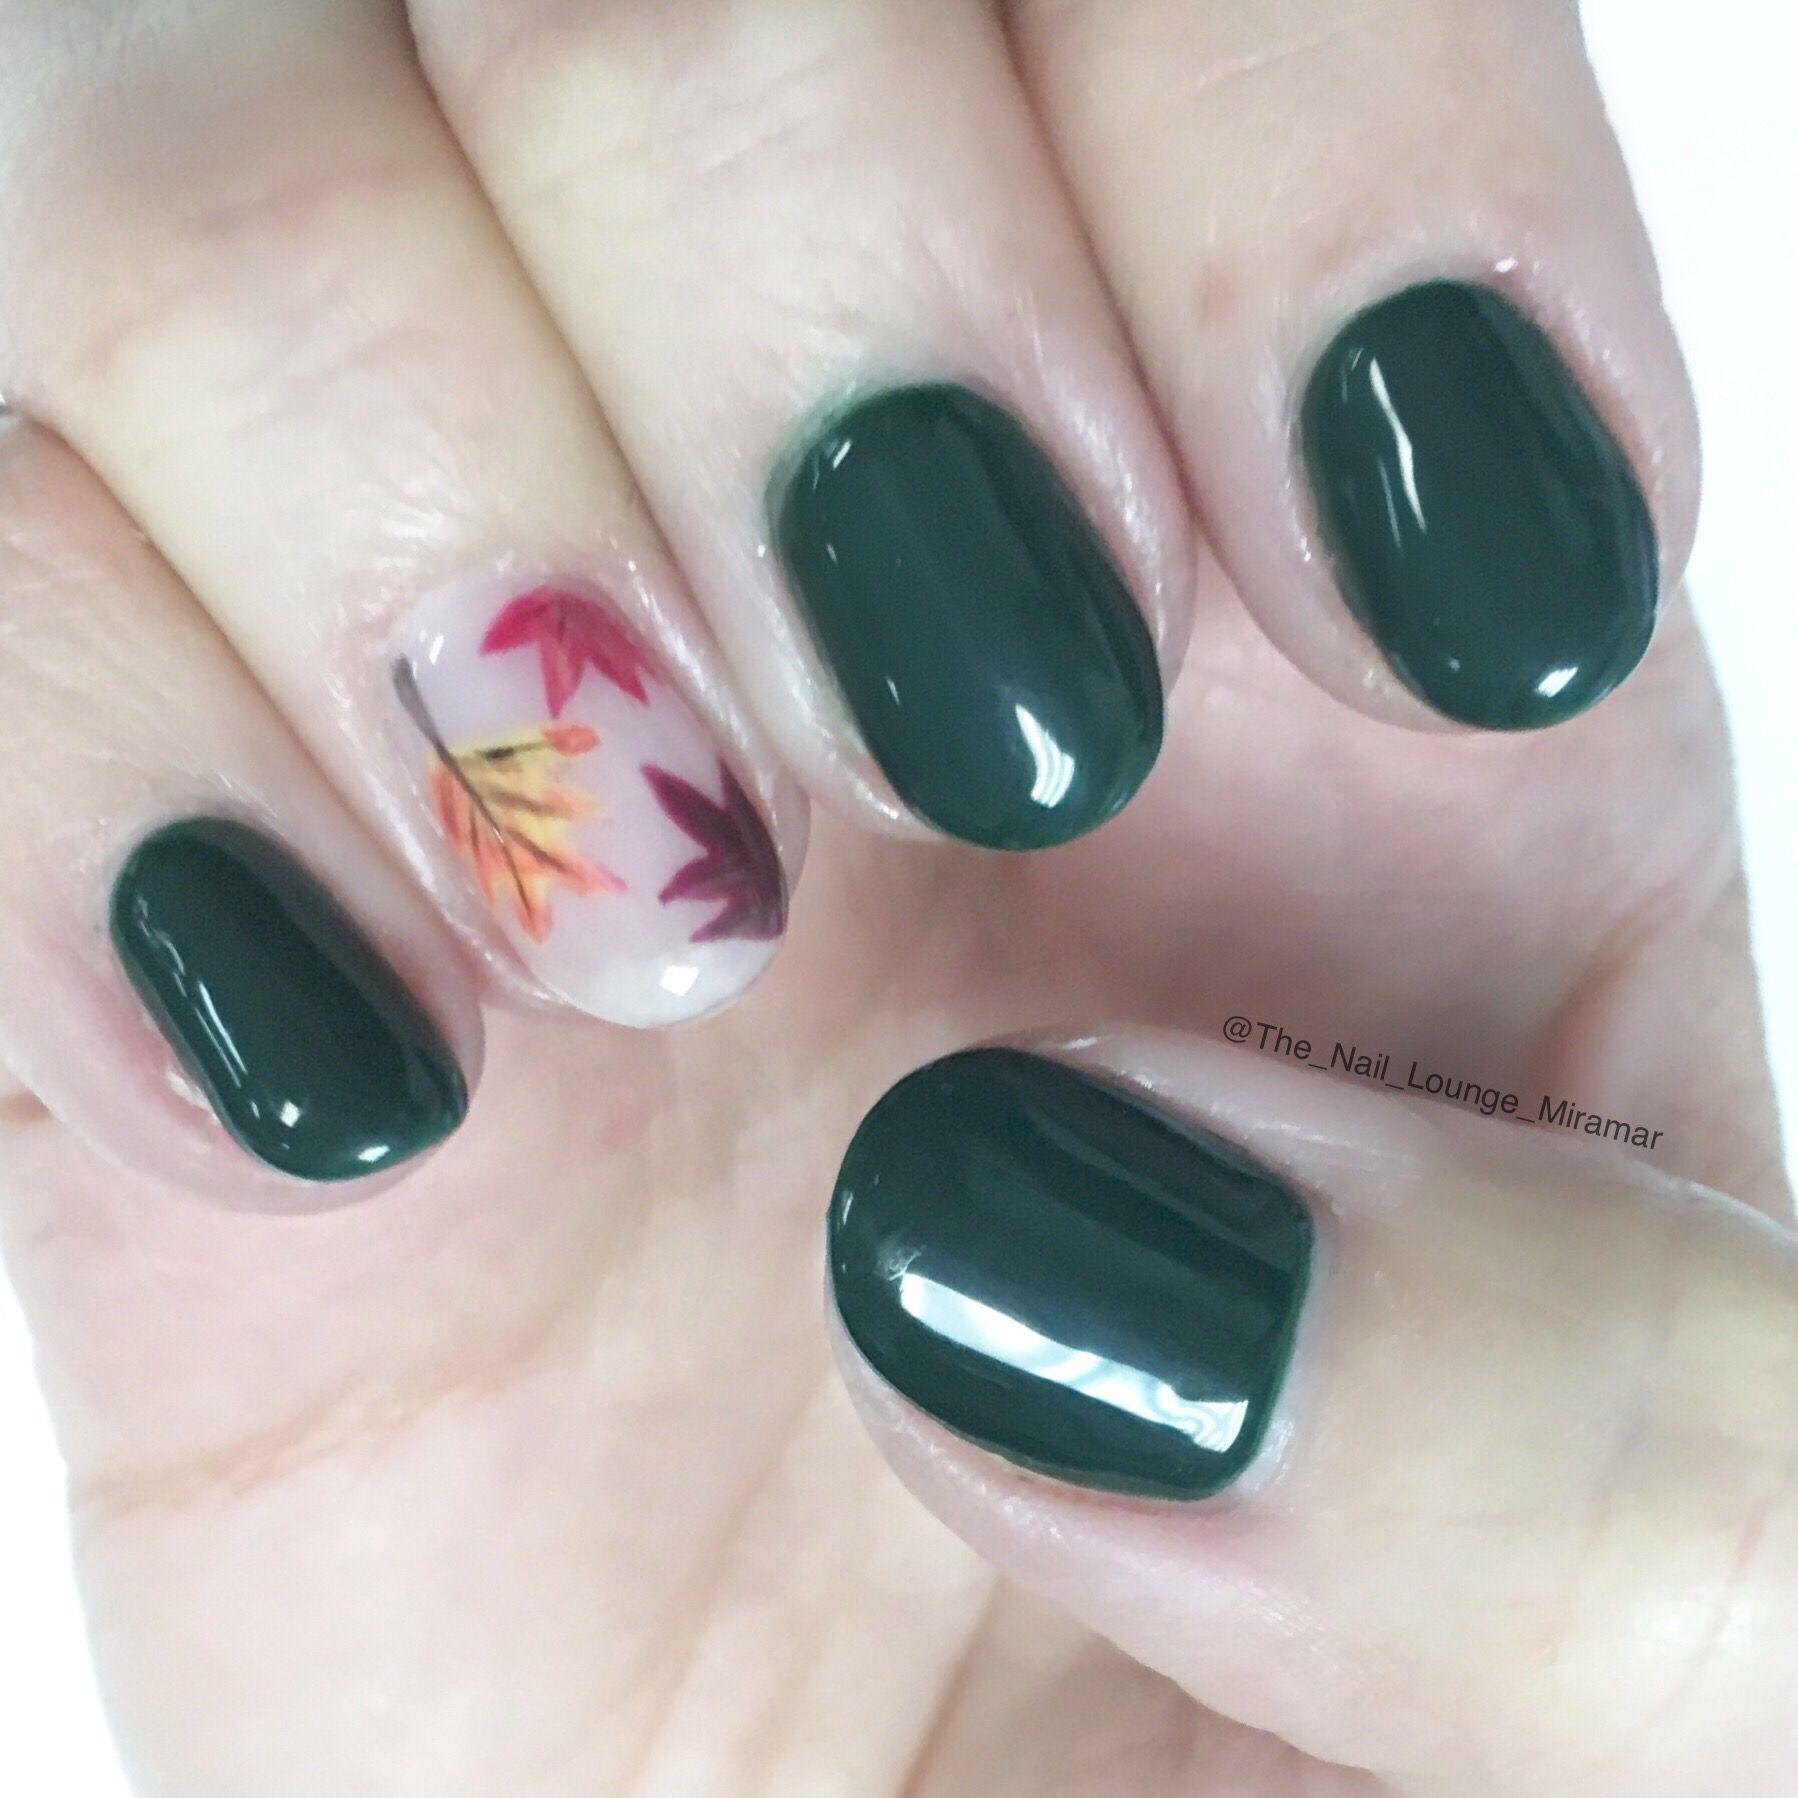 Fall leaves nail art design | Nail Art | Pinterest | Fall leaves